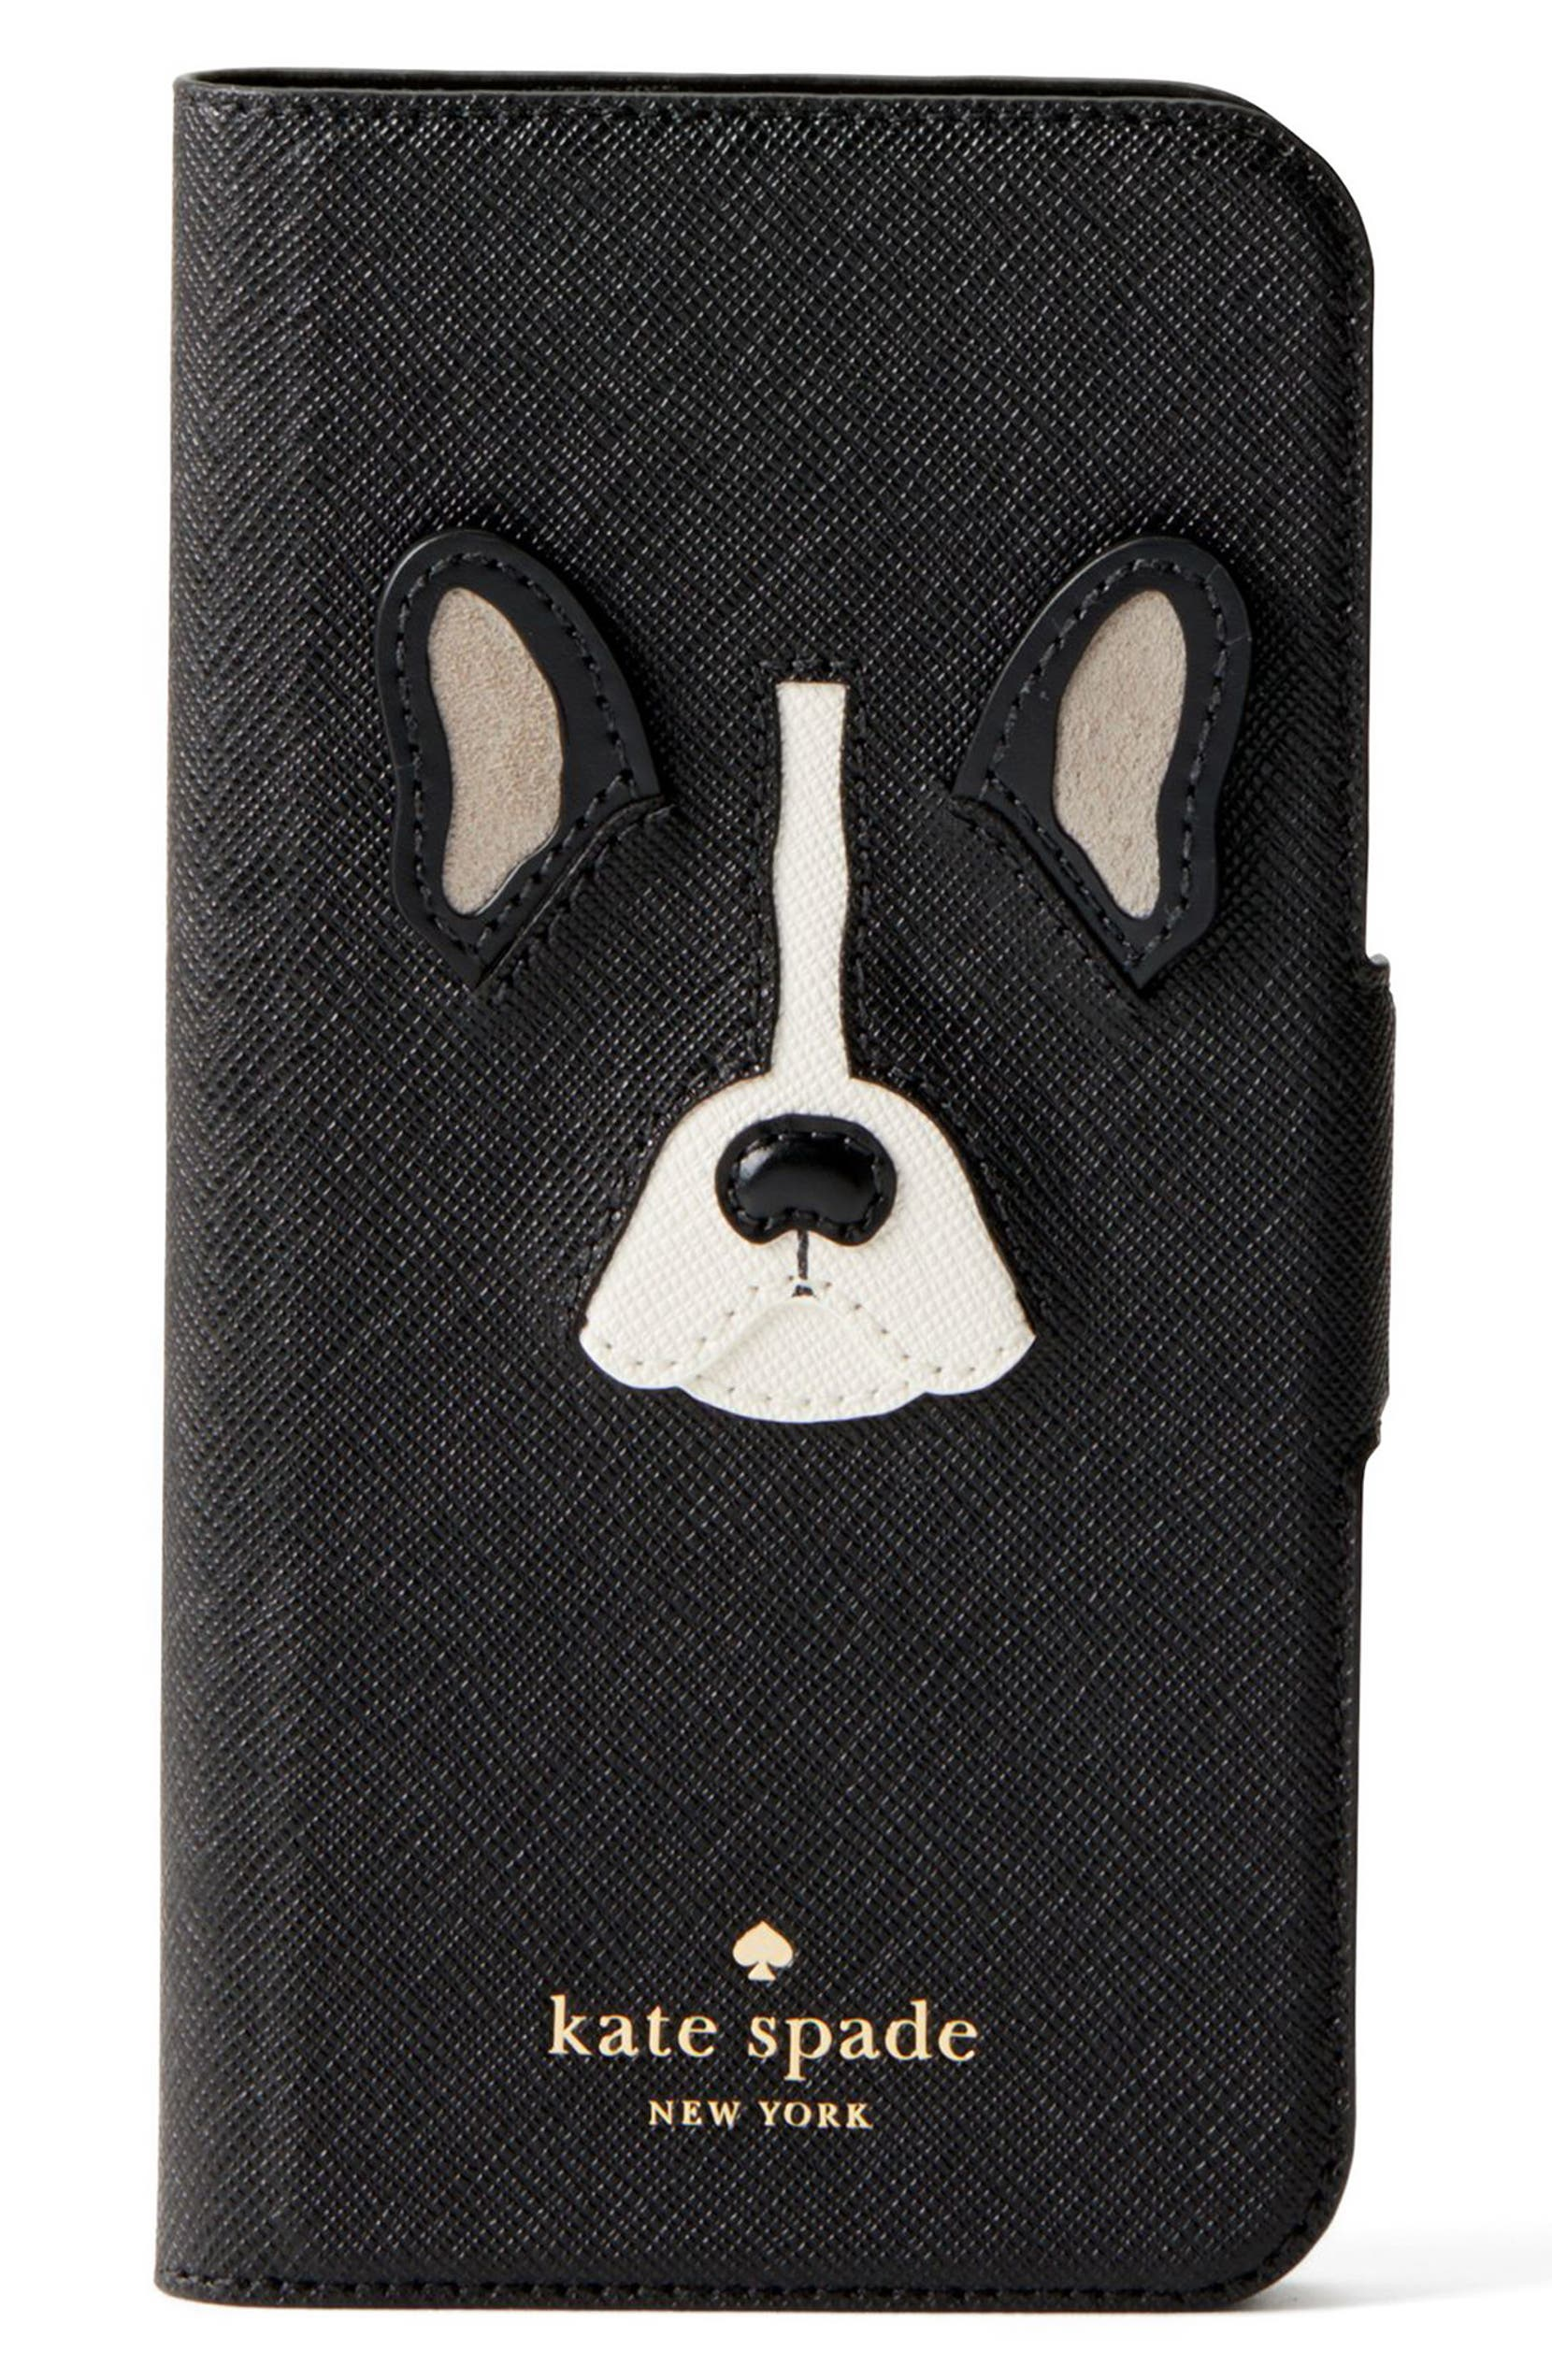 sale retailer 0ea72 60ce8 antoine appliqué leather iPhone X/Xs folio case